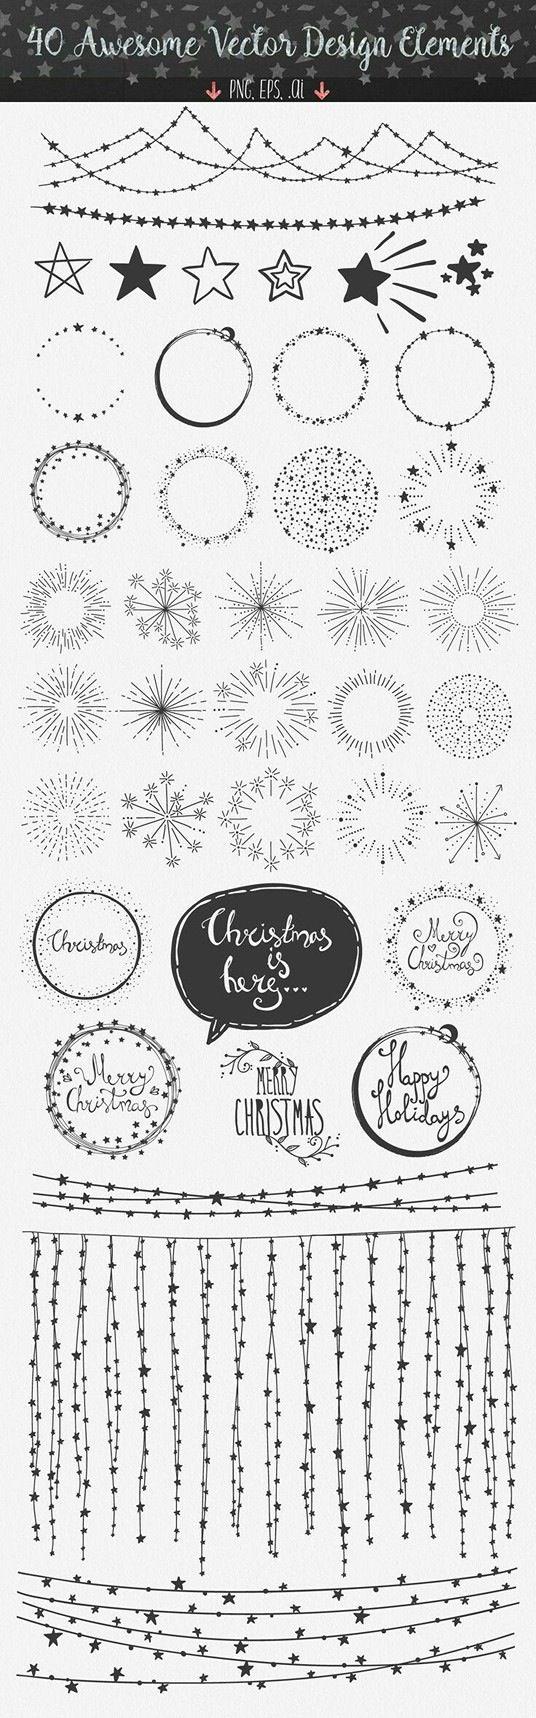 Christmas designs                                                                                                                                                                                 More